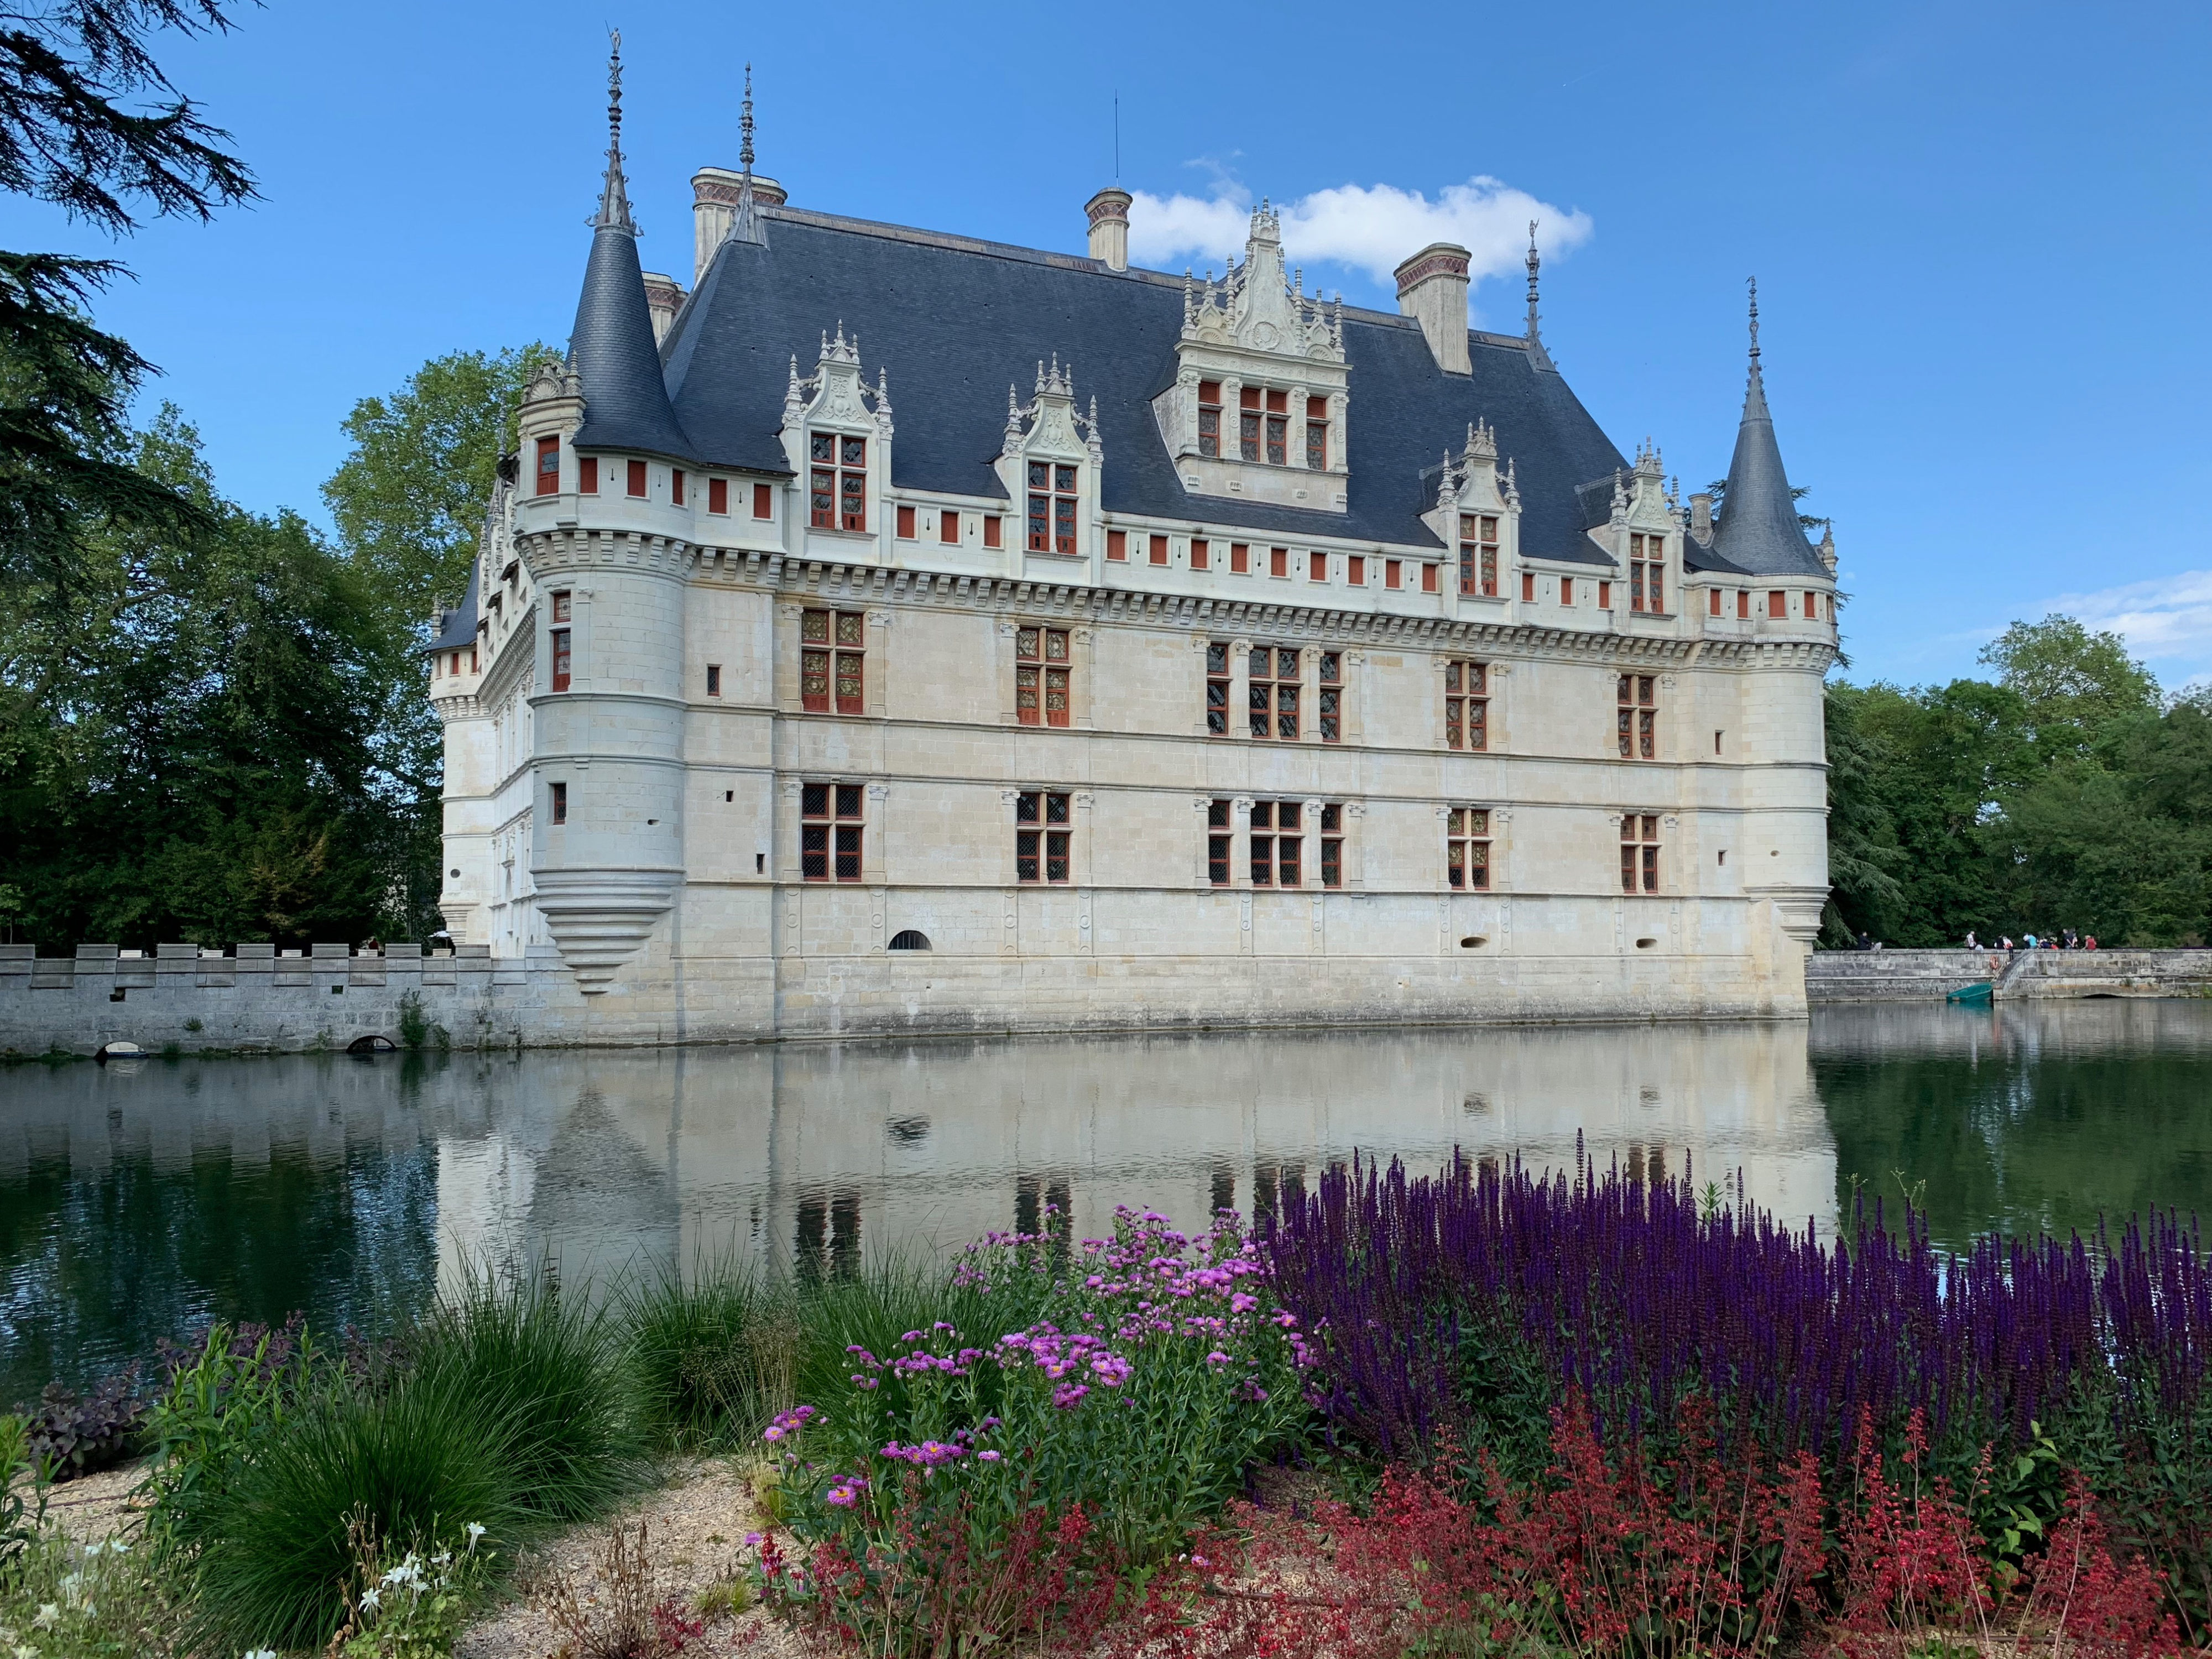 Azay-le-Rideau, das vom Indre umflossene Renaissance-Schloss